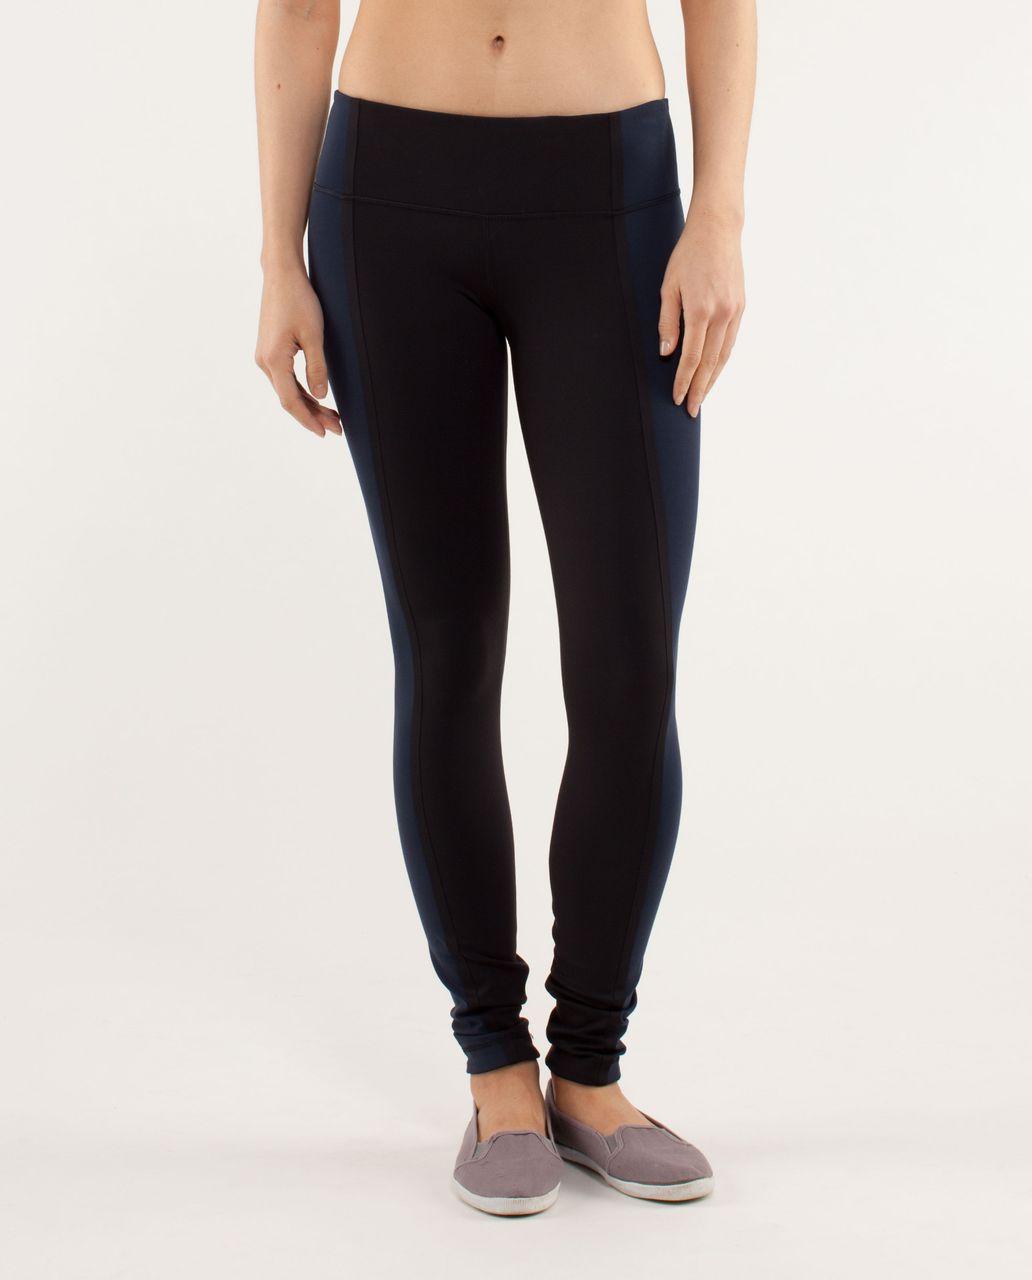 Lululemon Wunder Under Pant *Bonded Stripe - Black / Black / Black / Inkwell